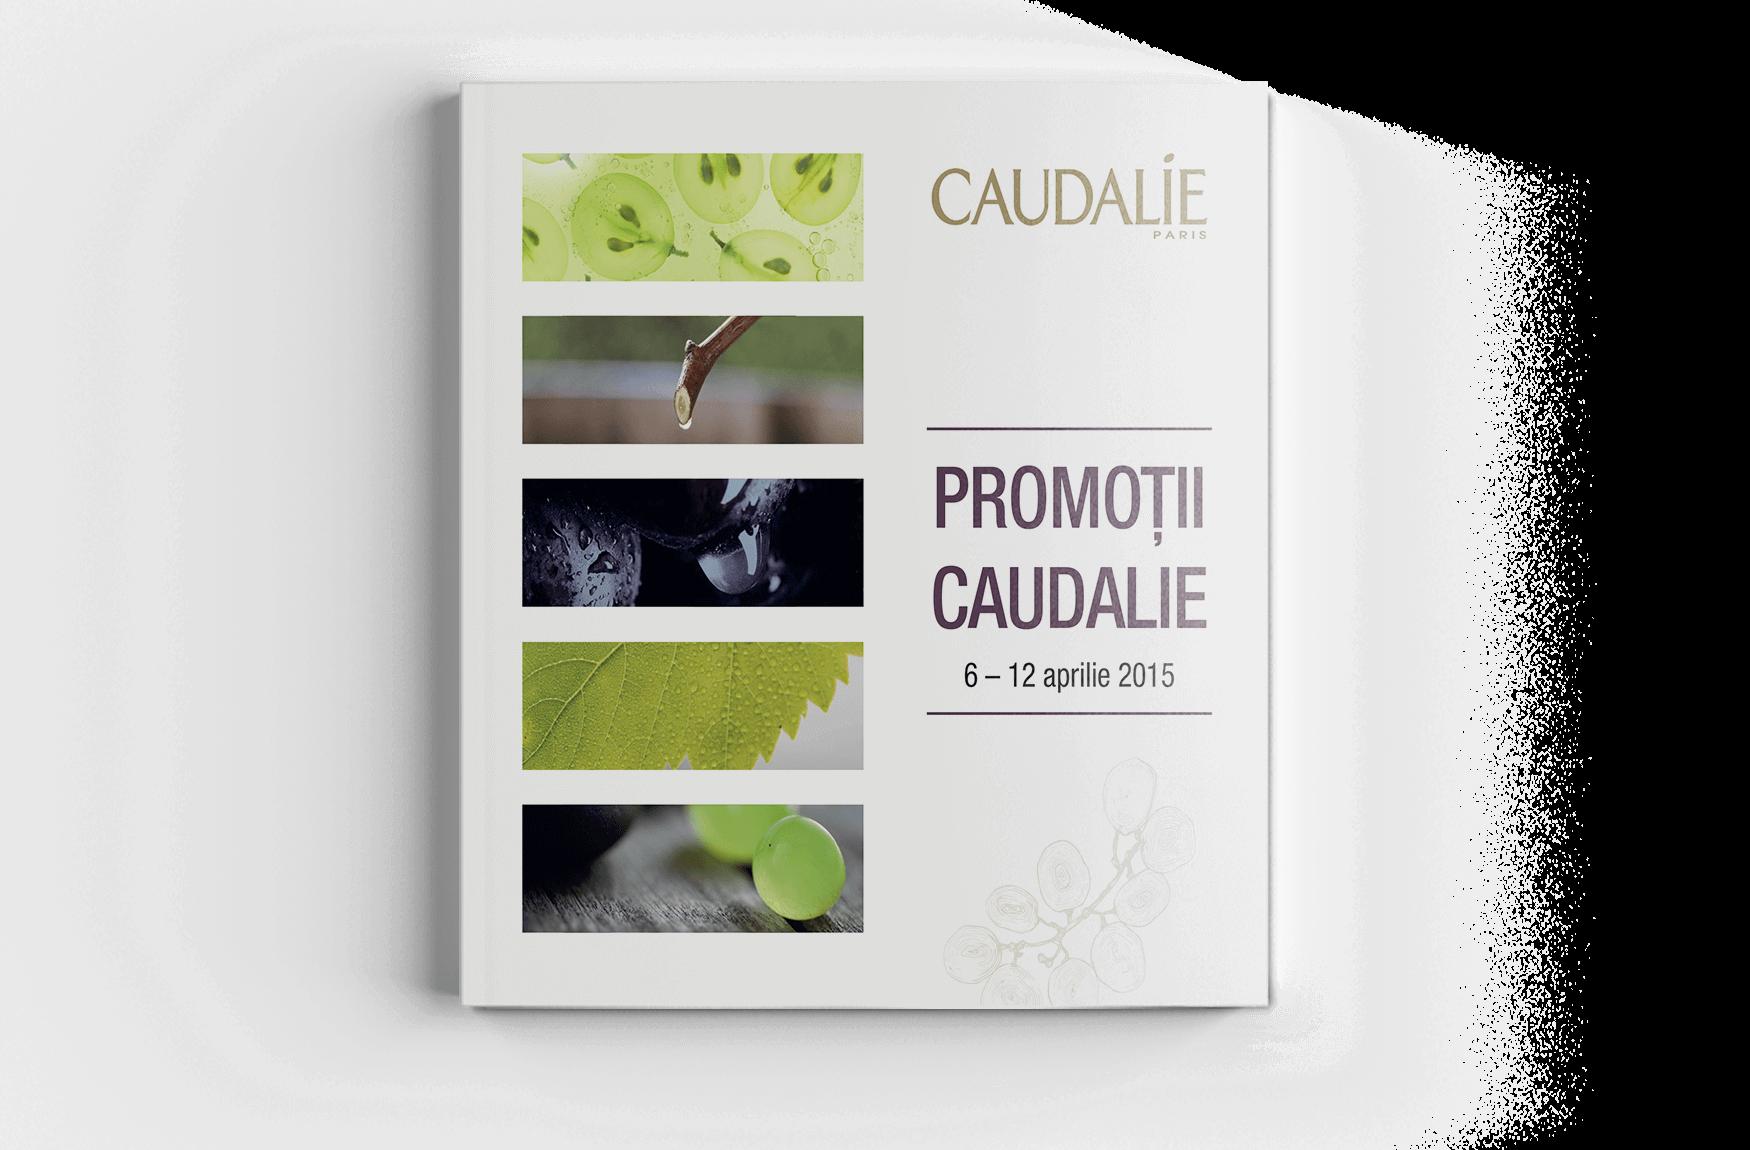 centrofarm_brochure-caudalie-martie-2015_cover